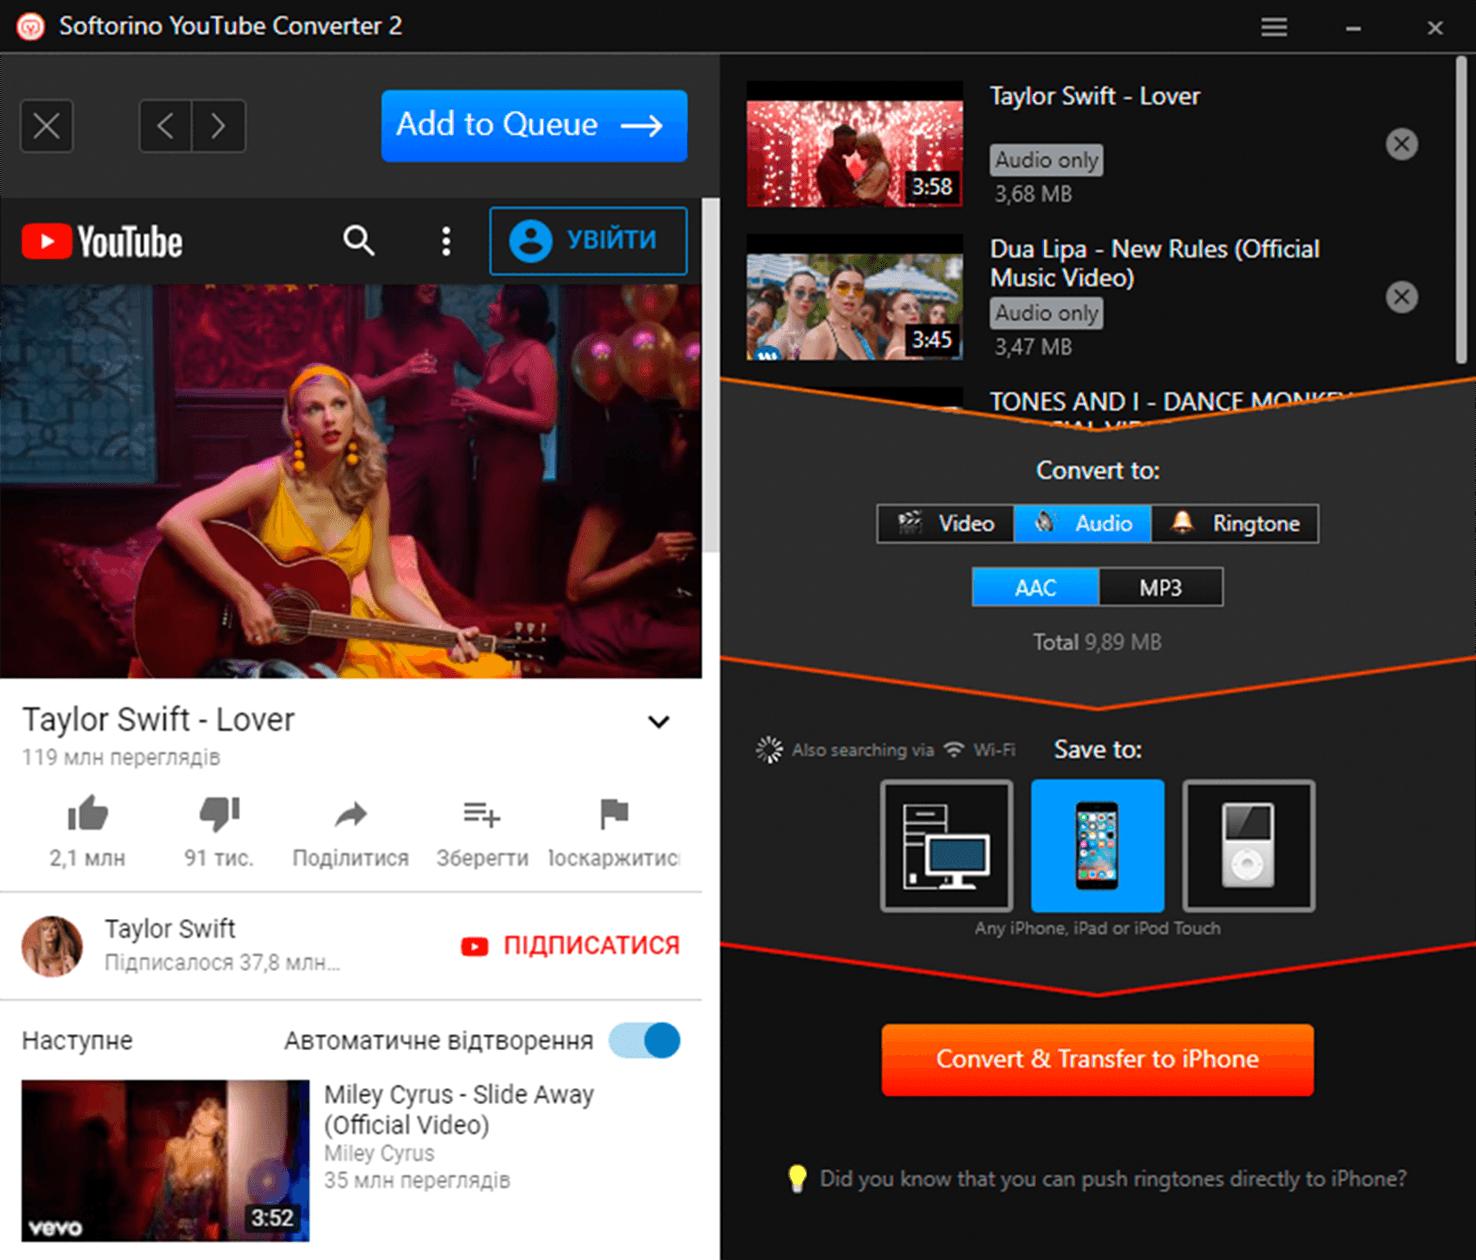 Image-6-Softorino YouTube Converter 2.png